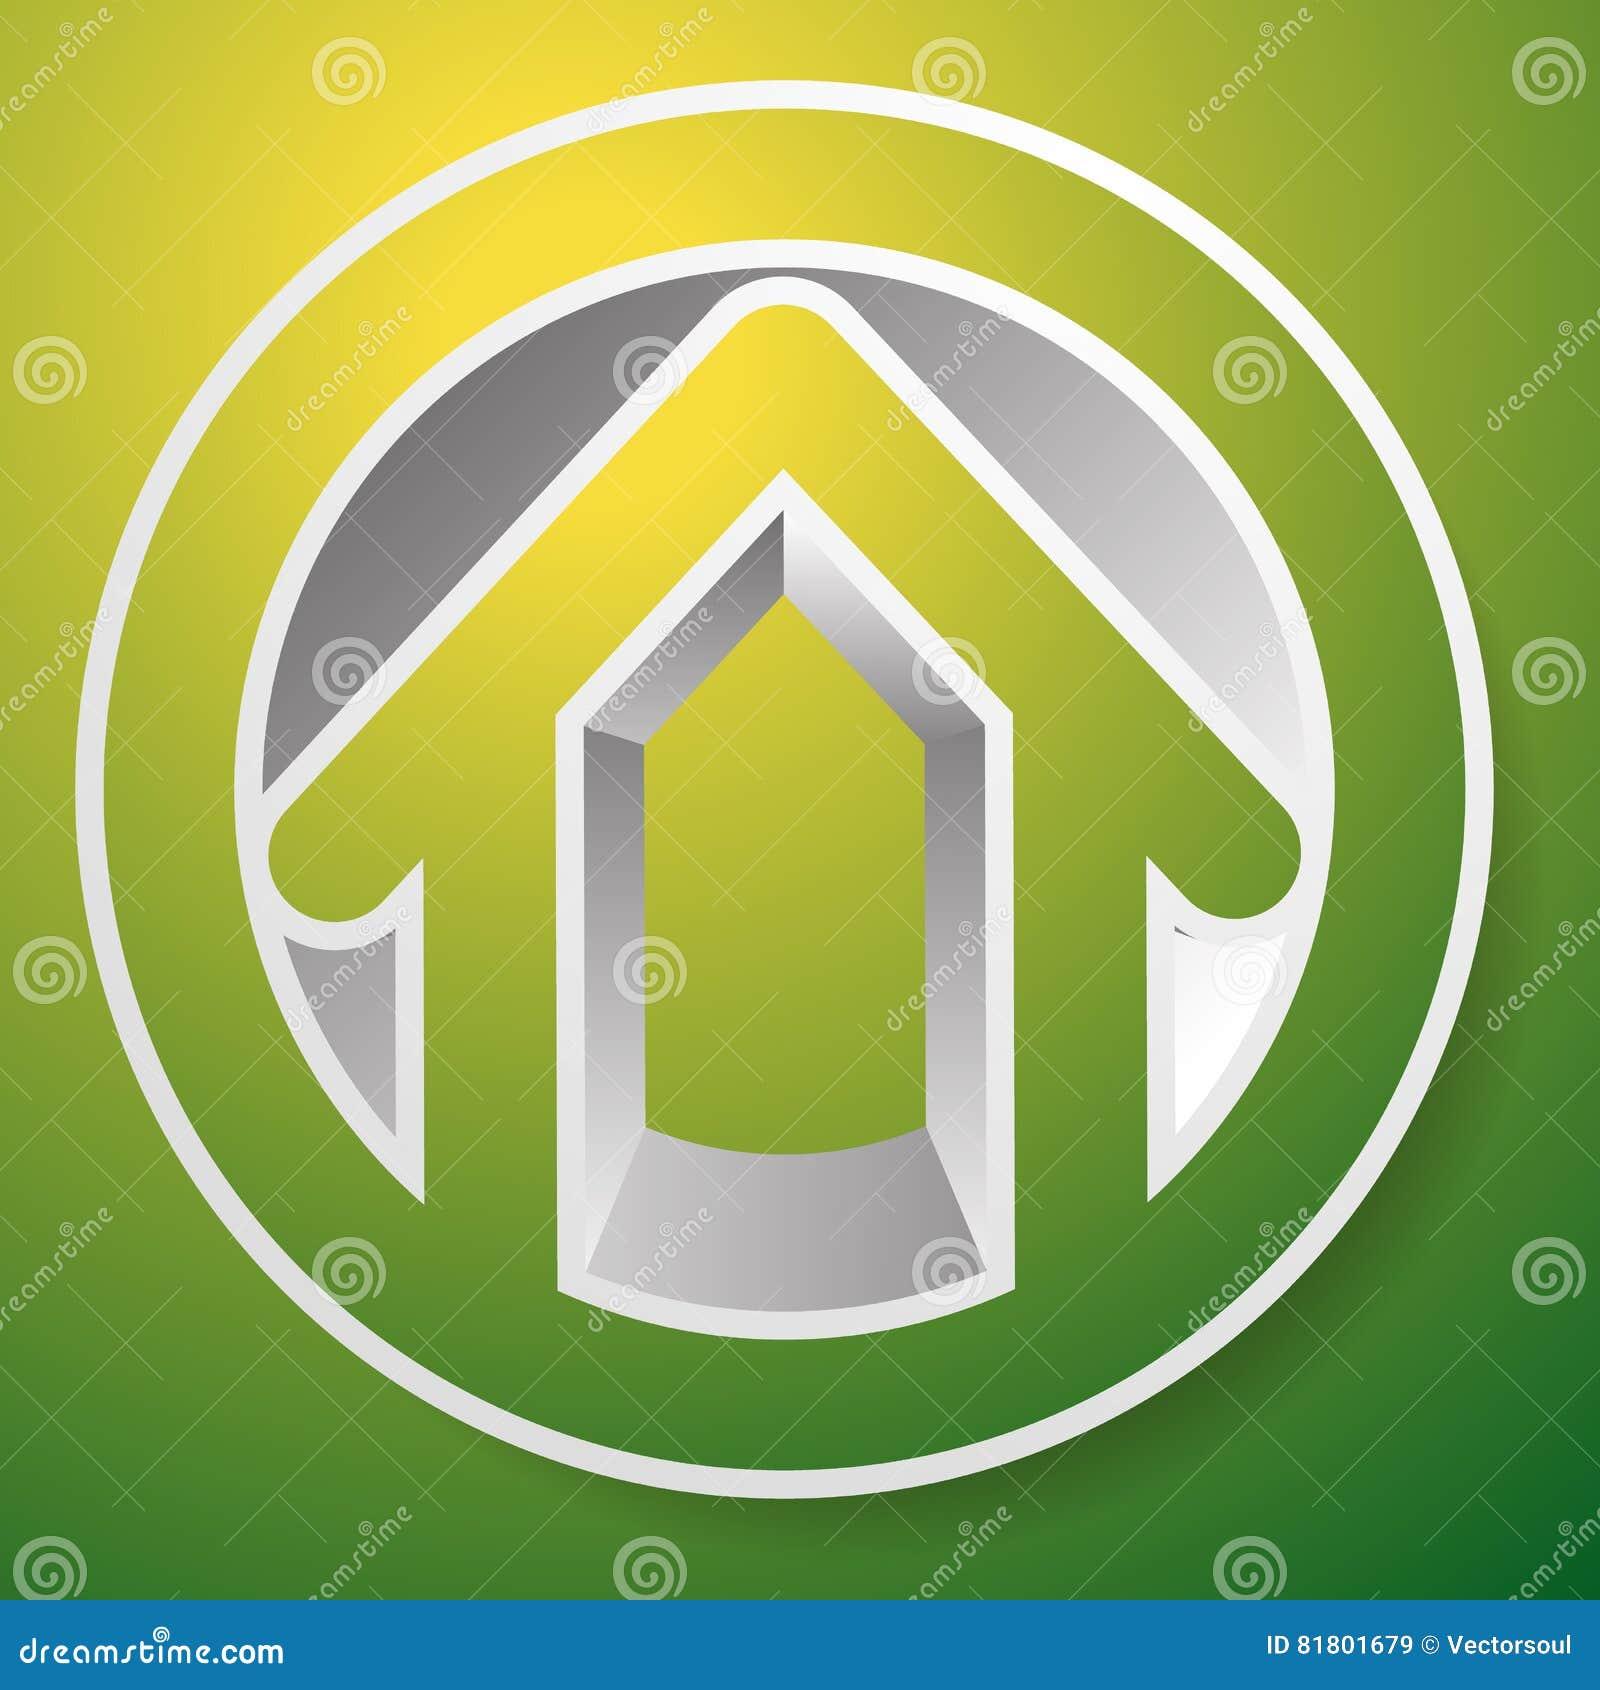 Оконтурите дом/символ, значок или логотип здания